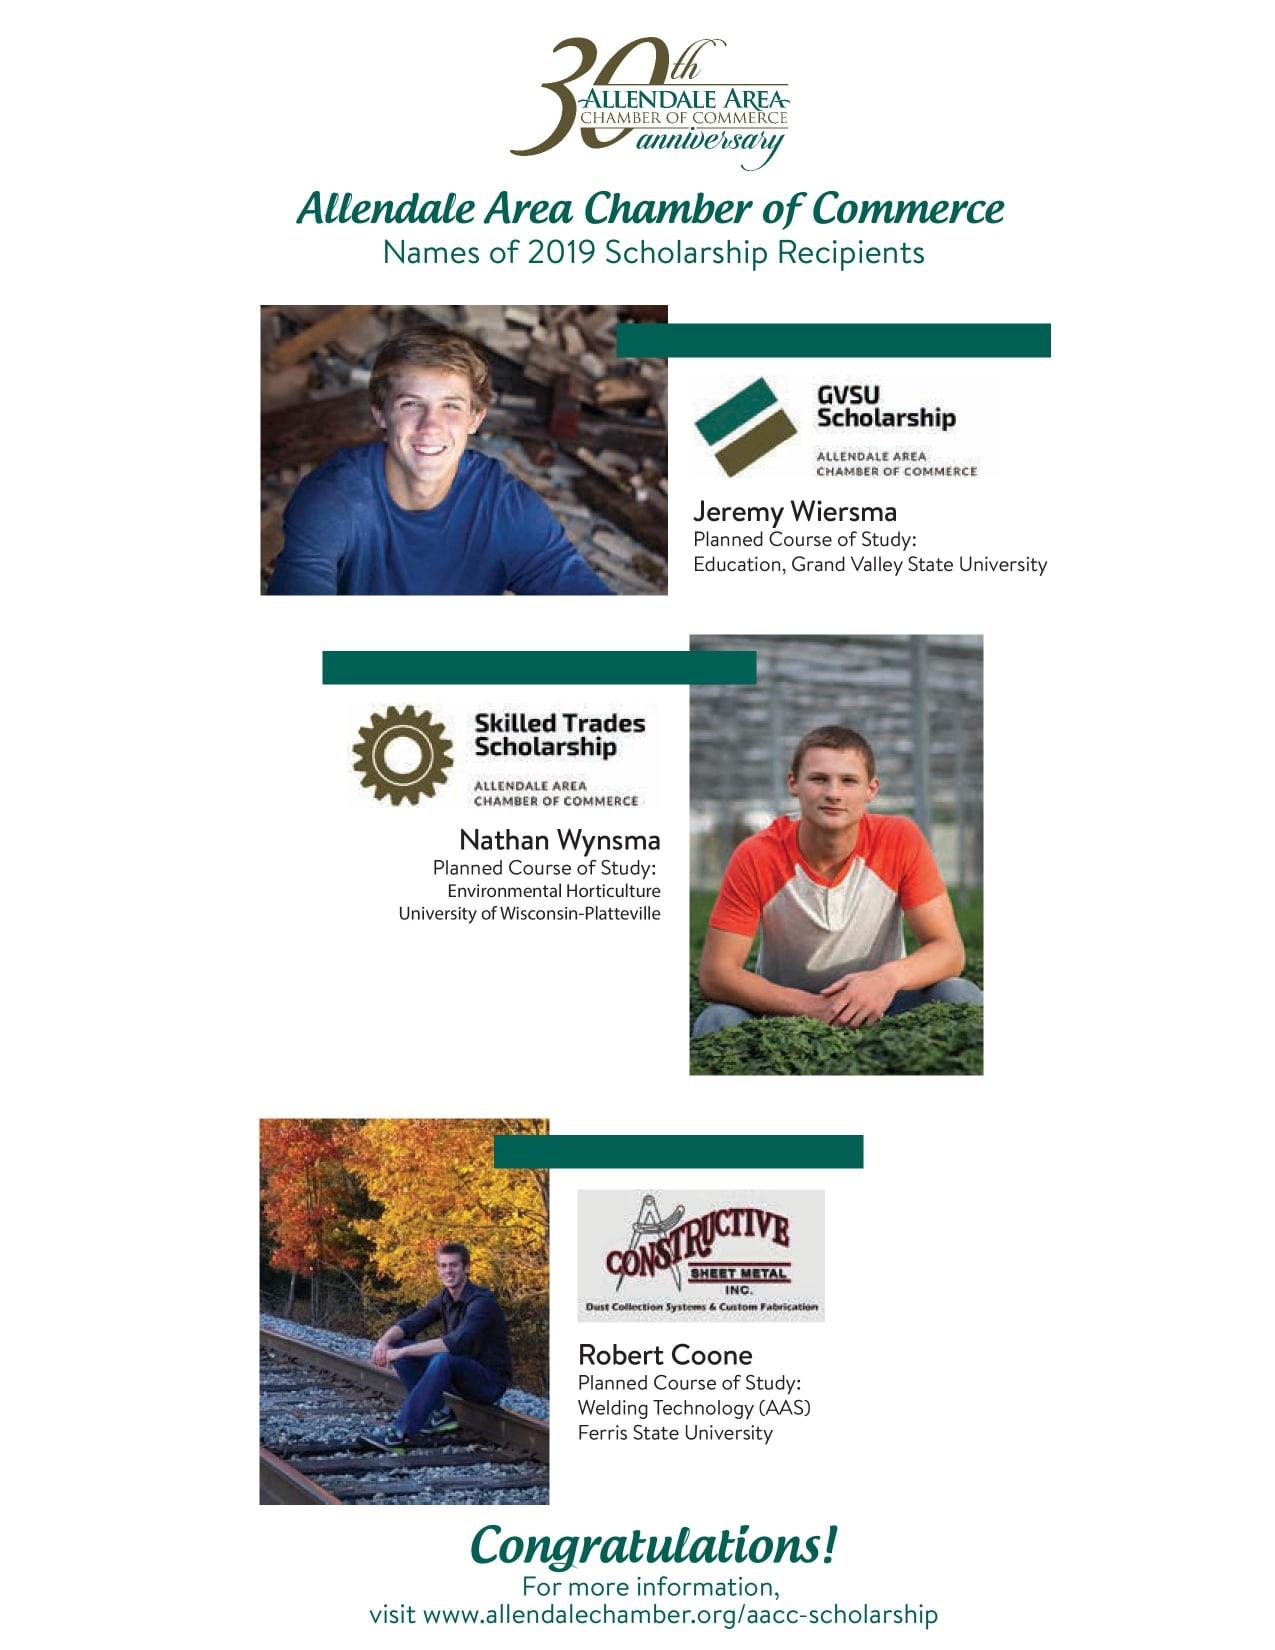 2019-Scholarship-recipients-page-001-w1275.jpg